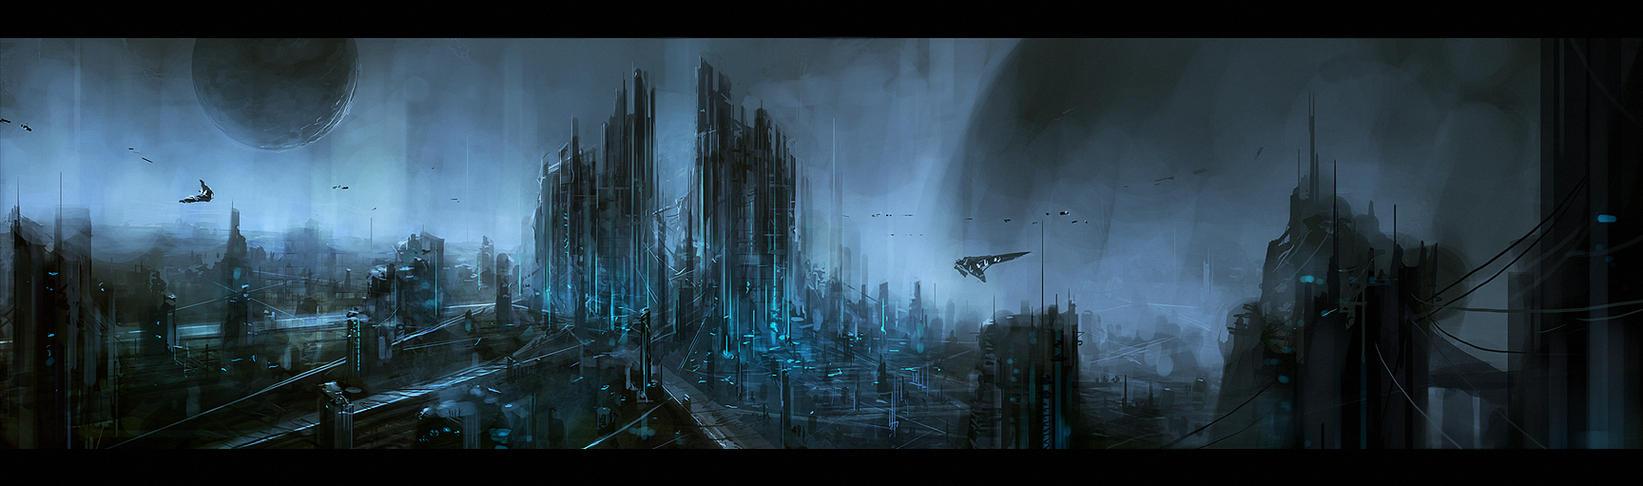 Scythe City by ChrisCold